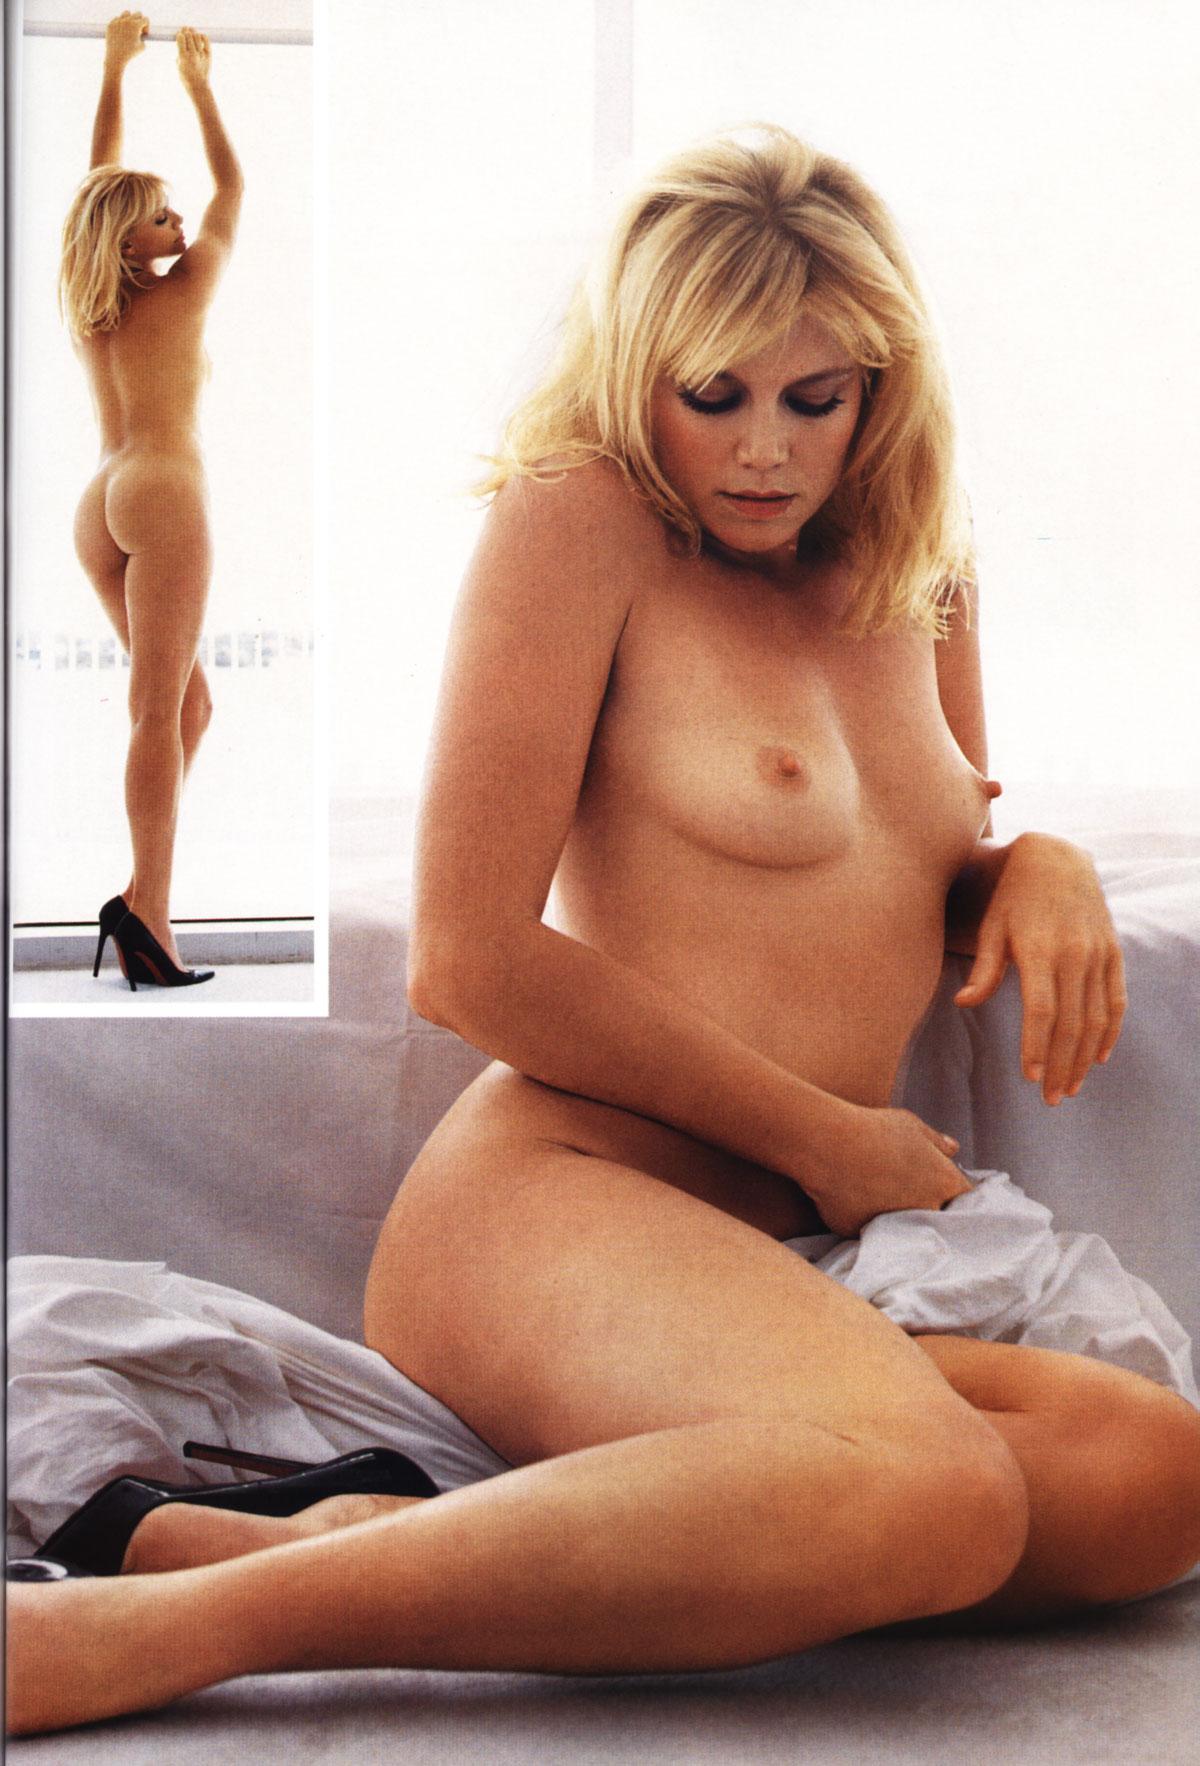 peta wilson tits